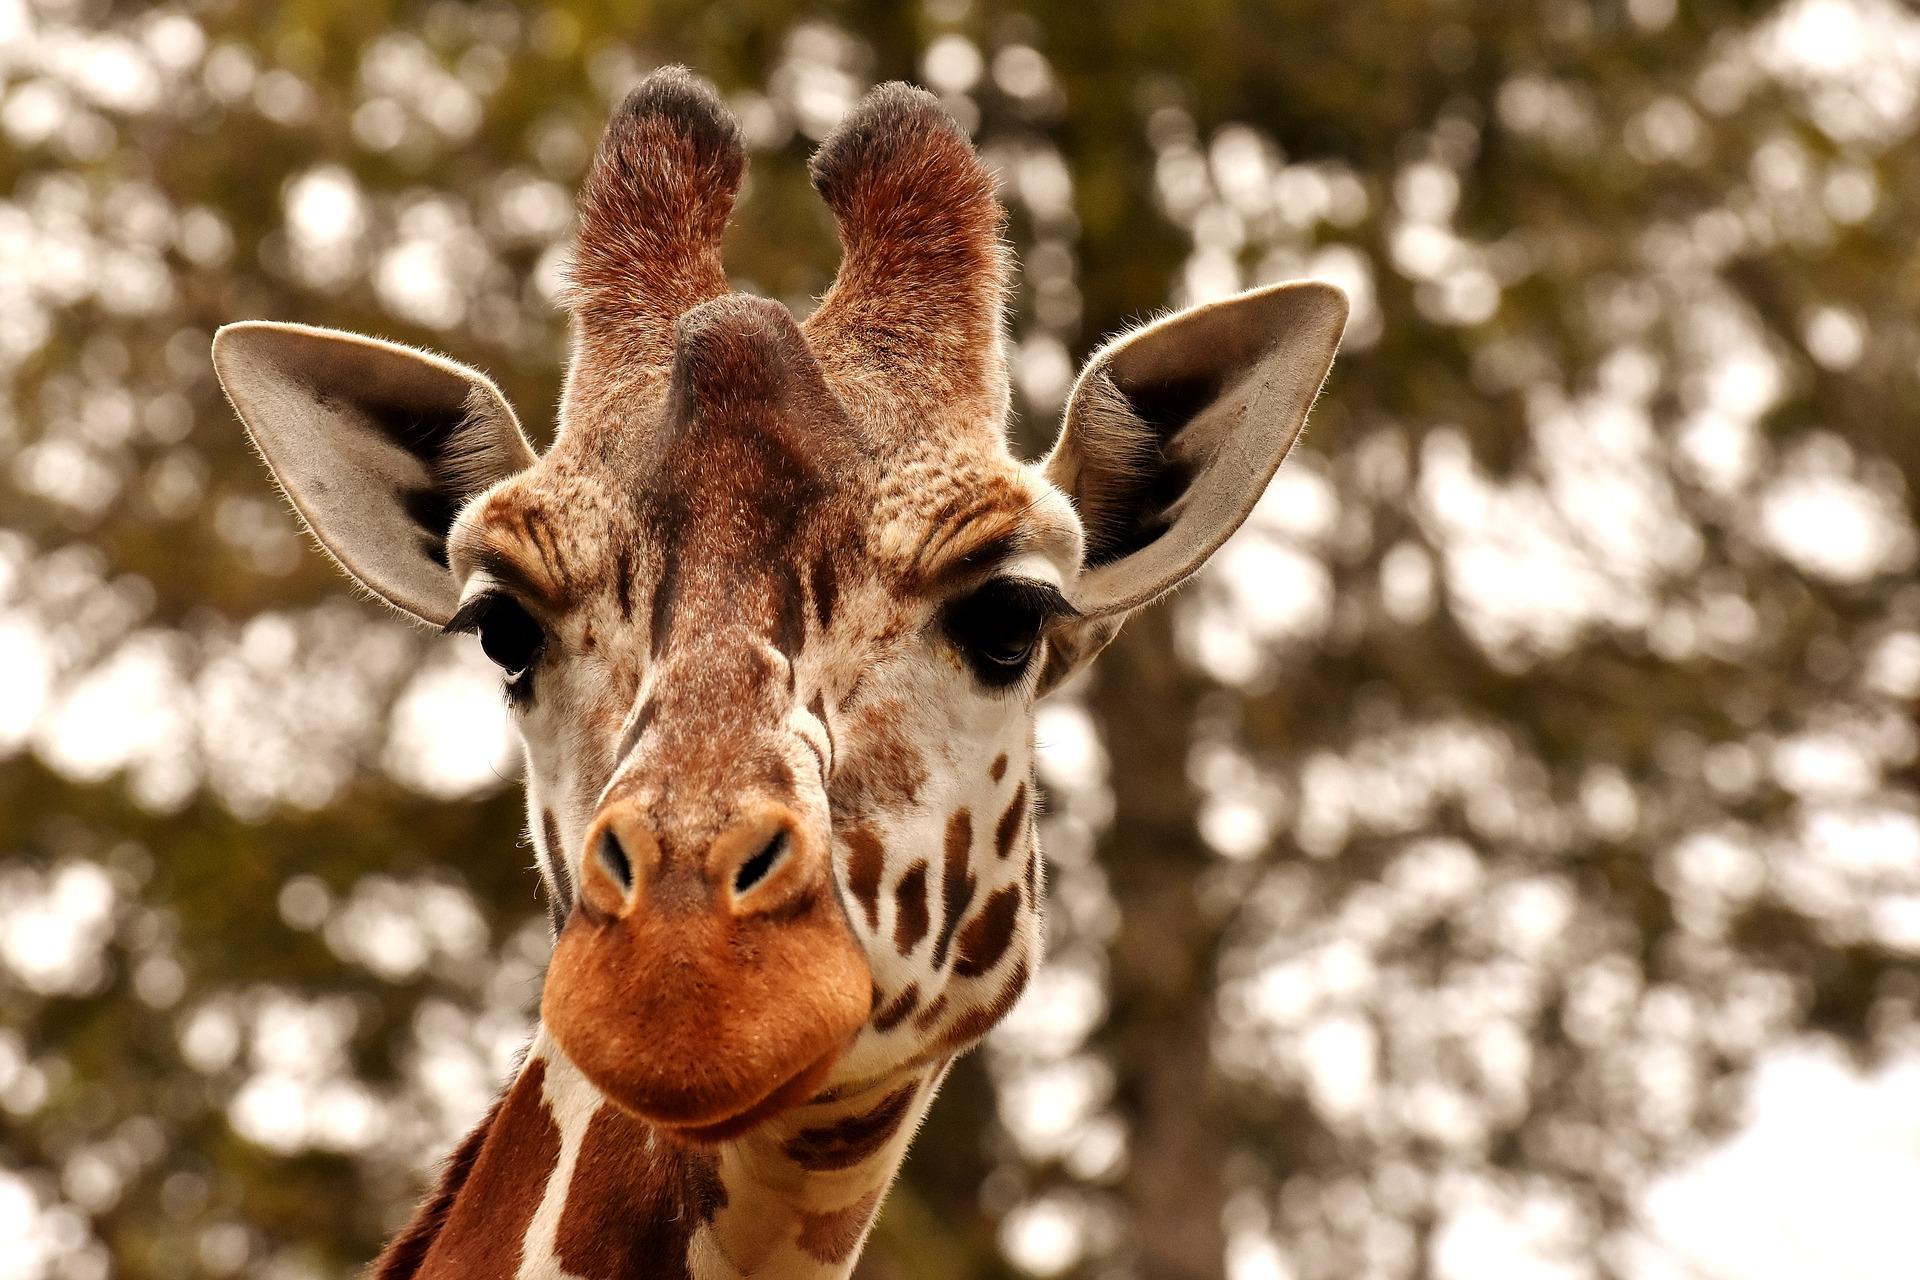 download wallpaper: giraf wallpaper